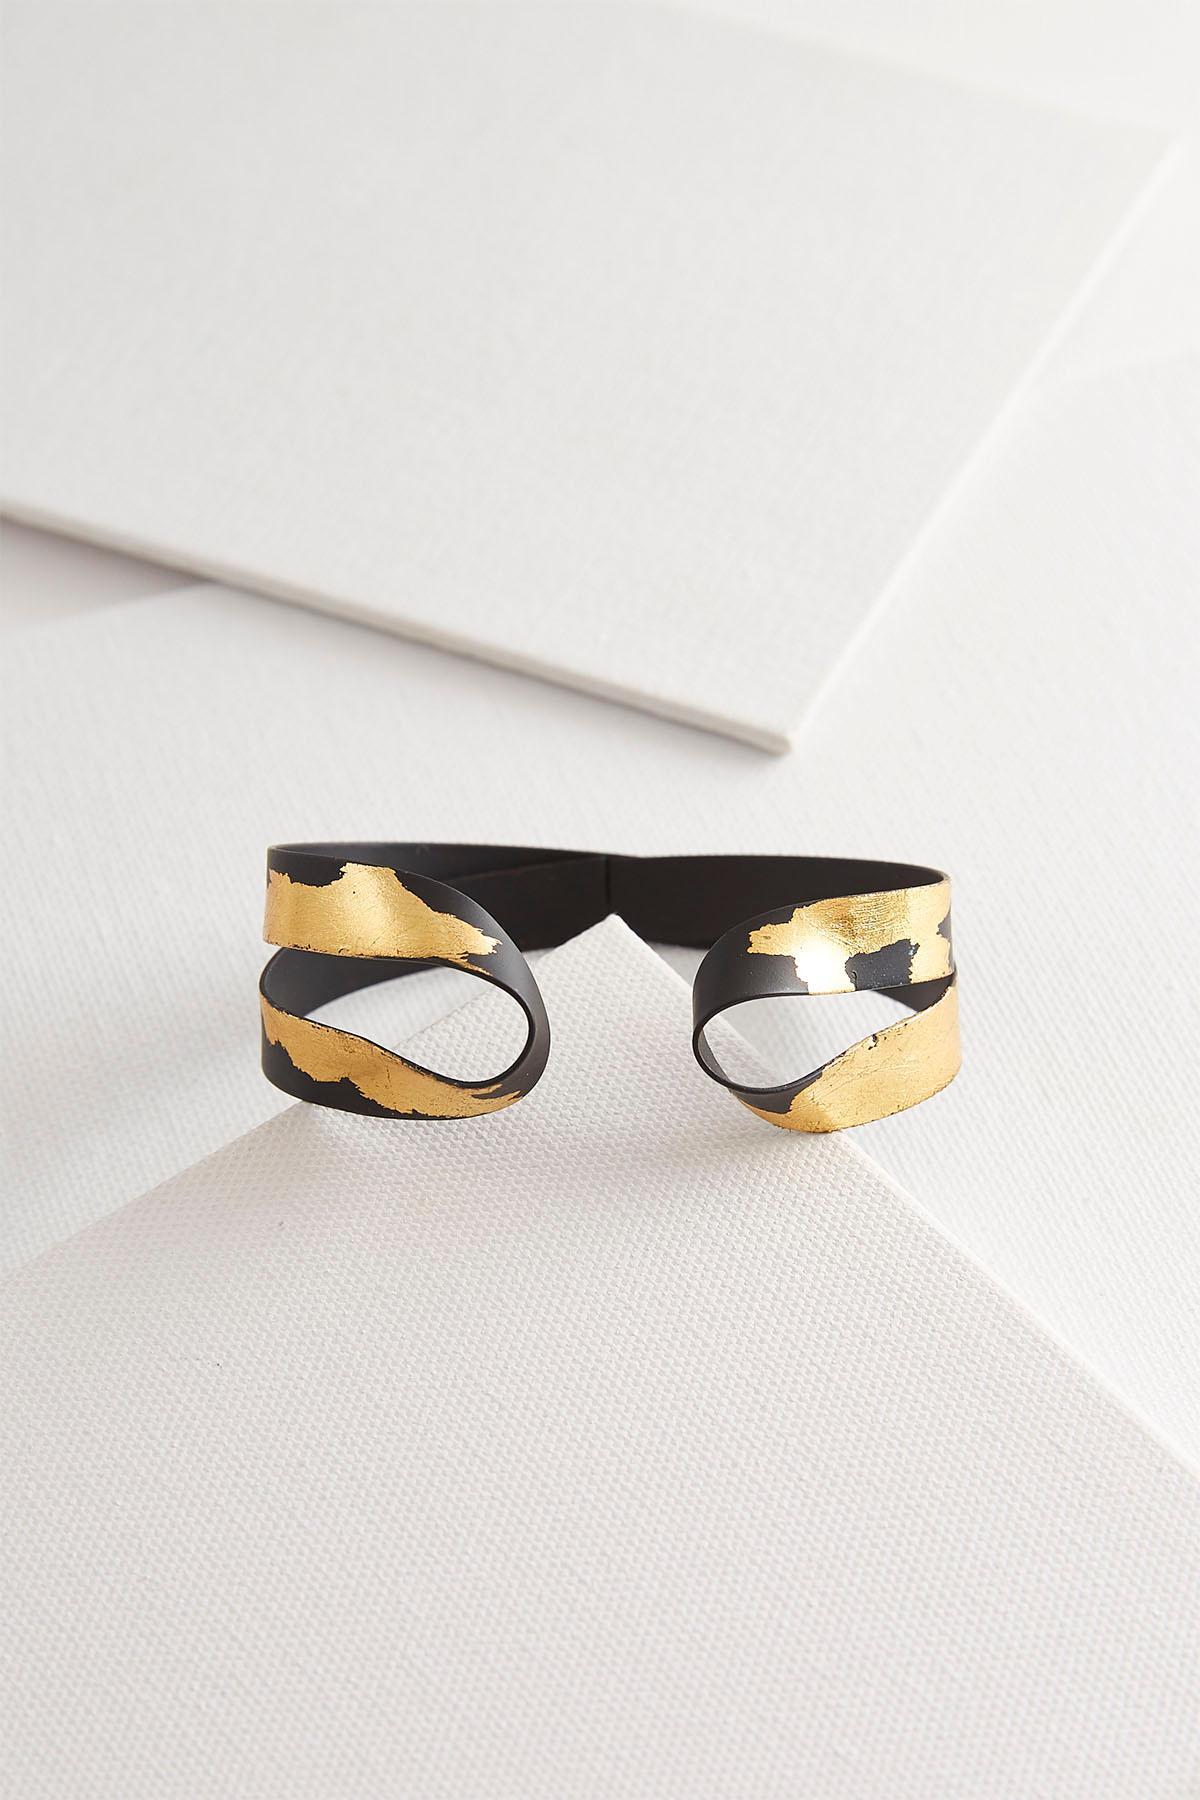 Splashed Gold Black Cuff